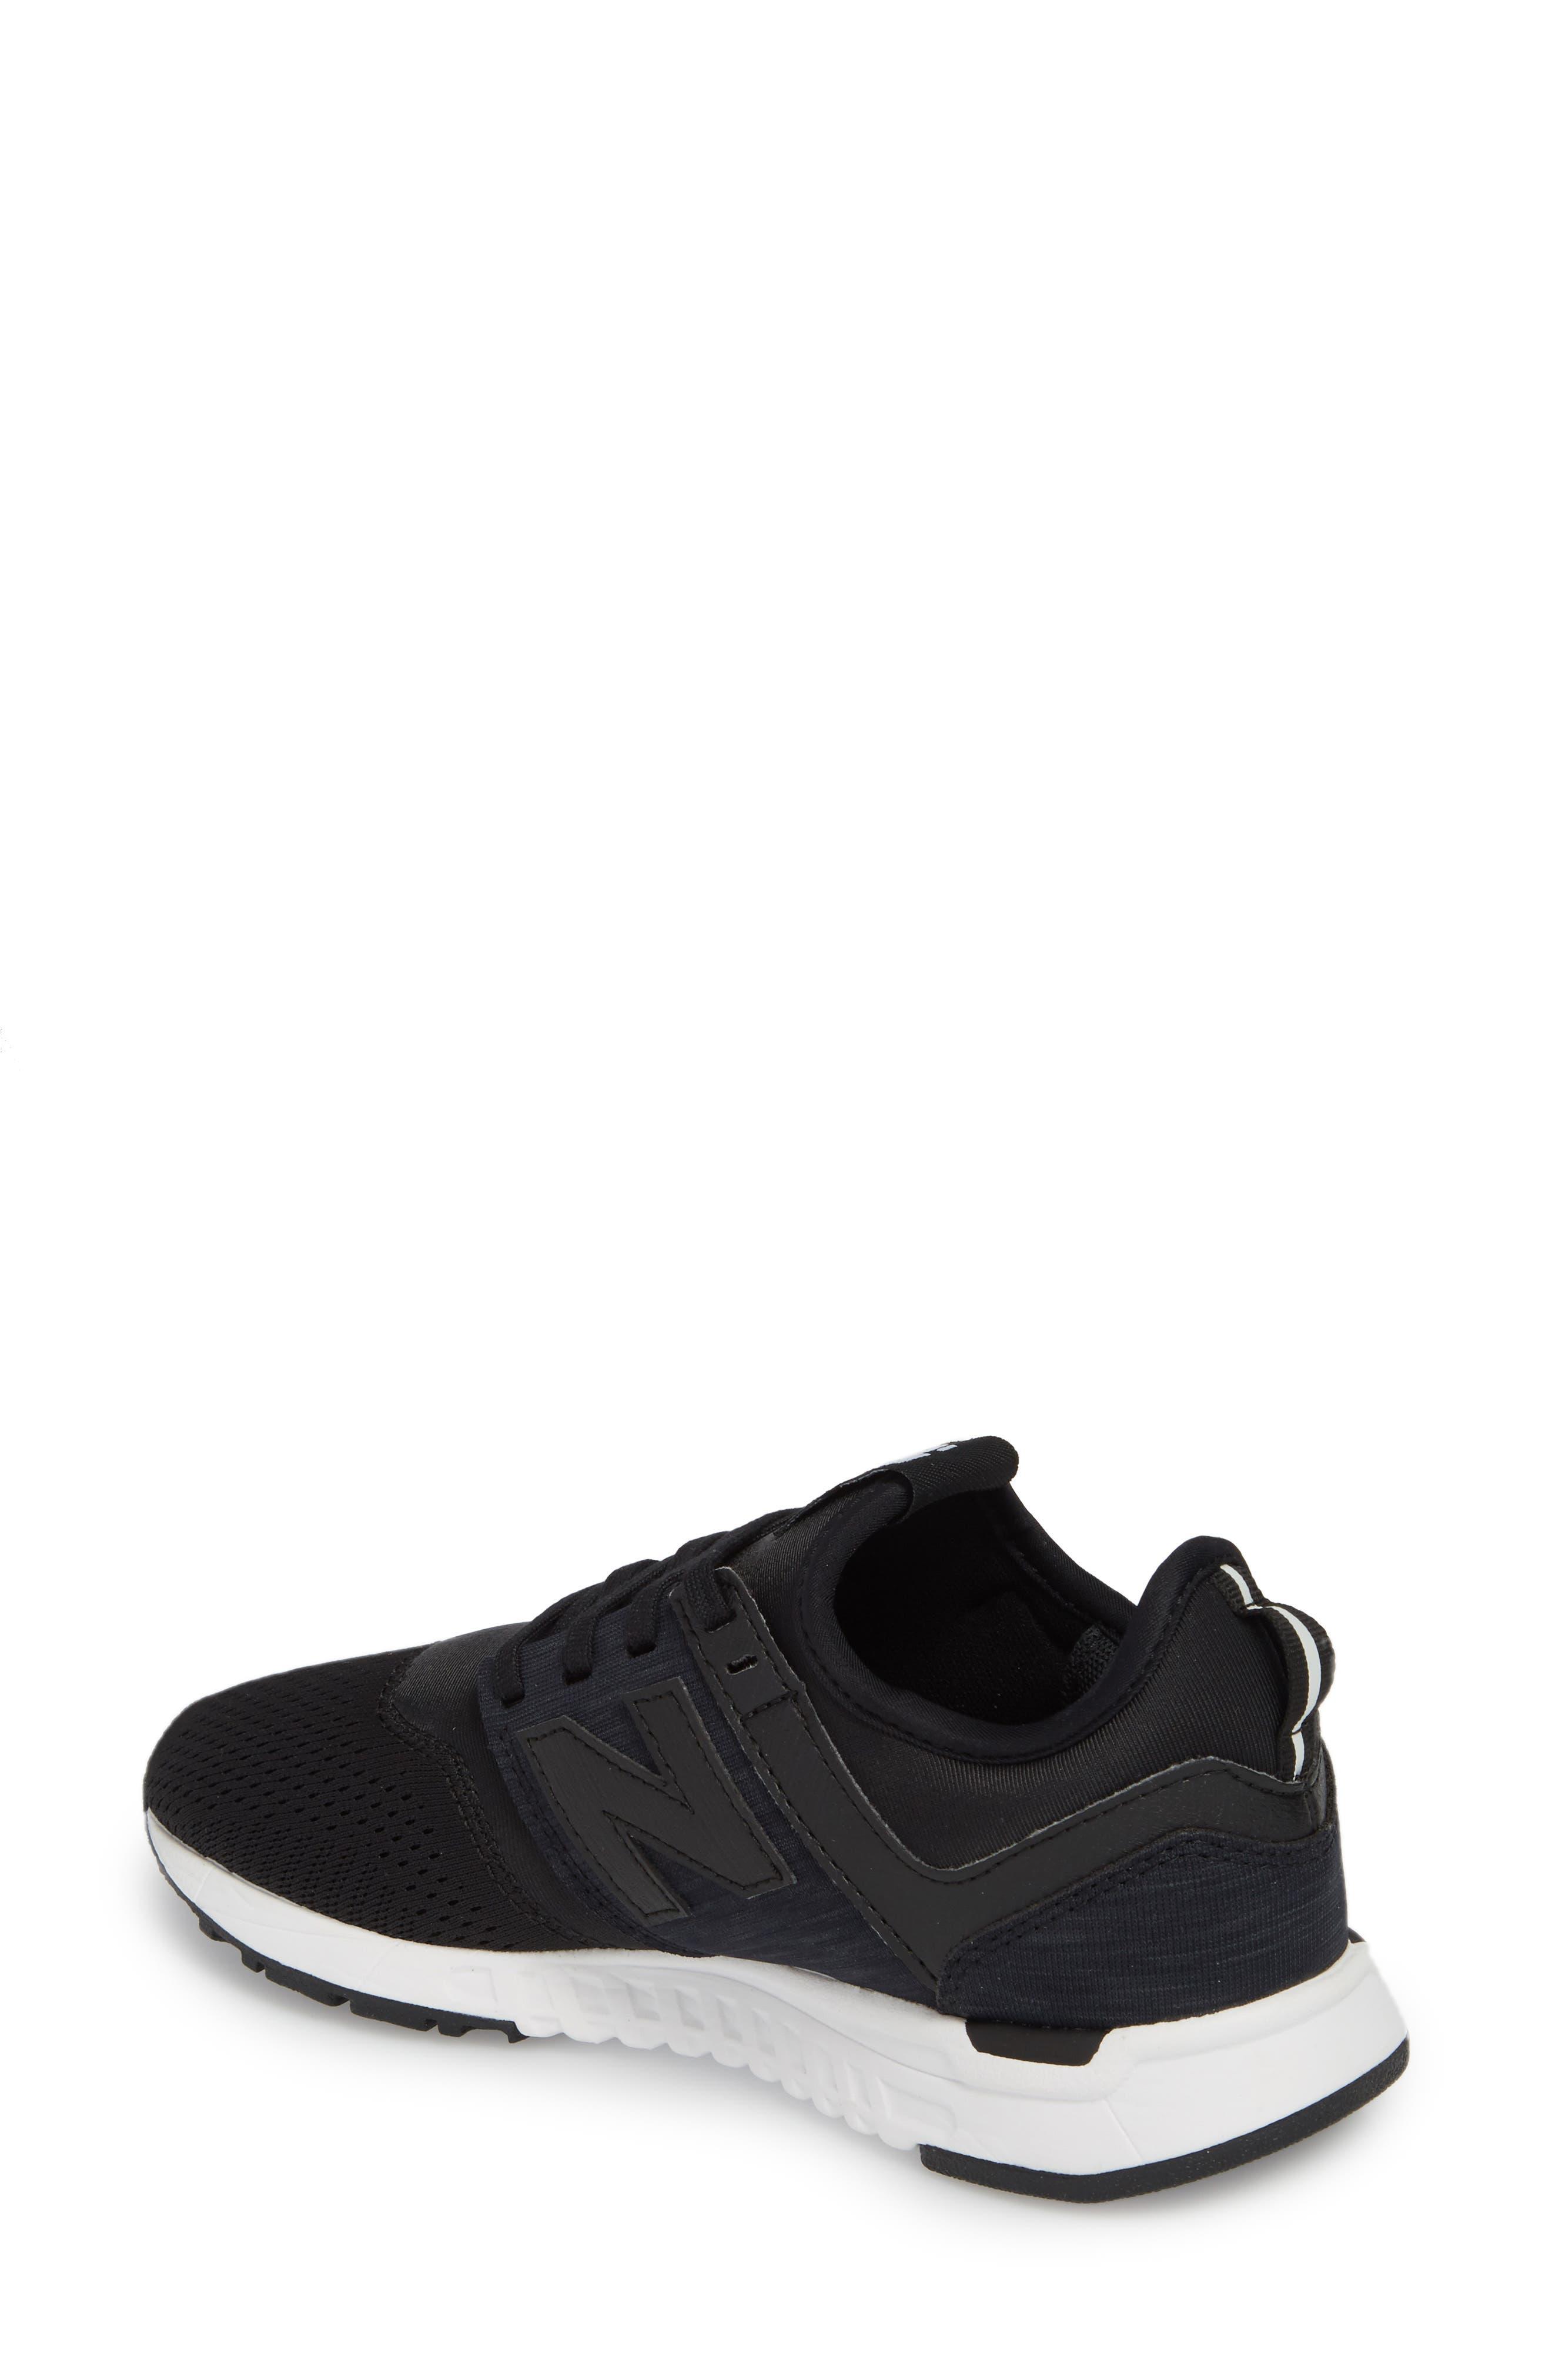 247 Classic Sneaker,                             Alternate thumbnail 2, color,                             Black